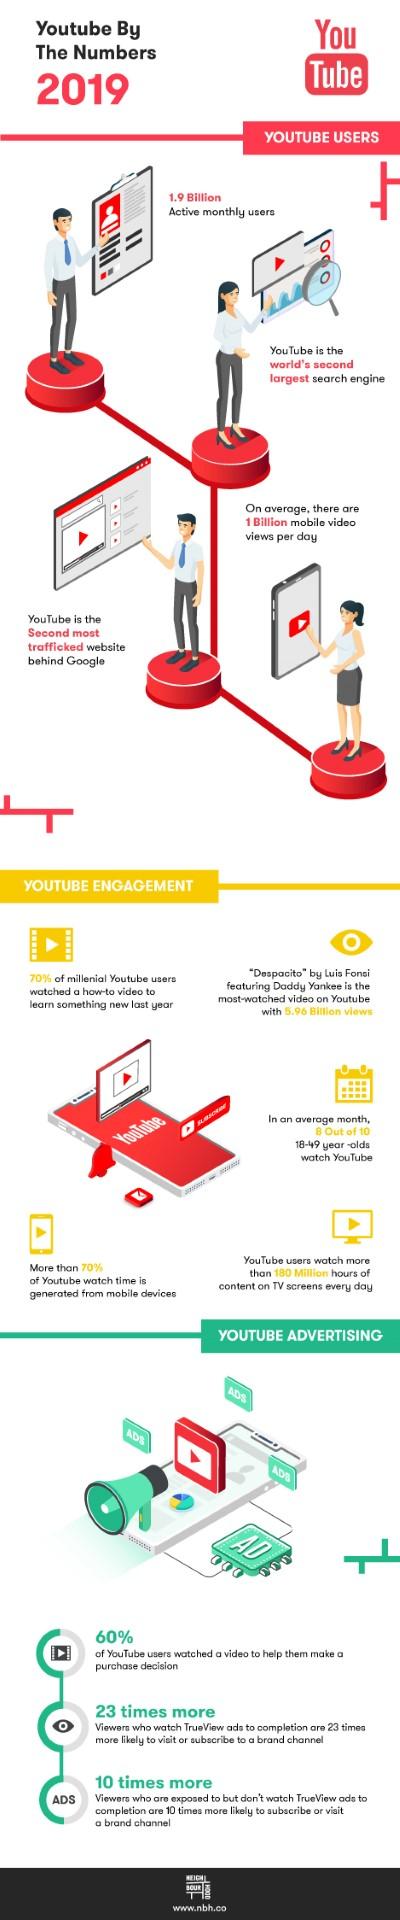 youtube-statistics-infographic